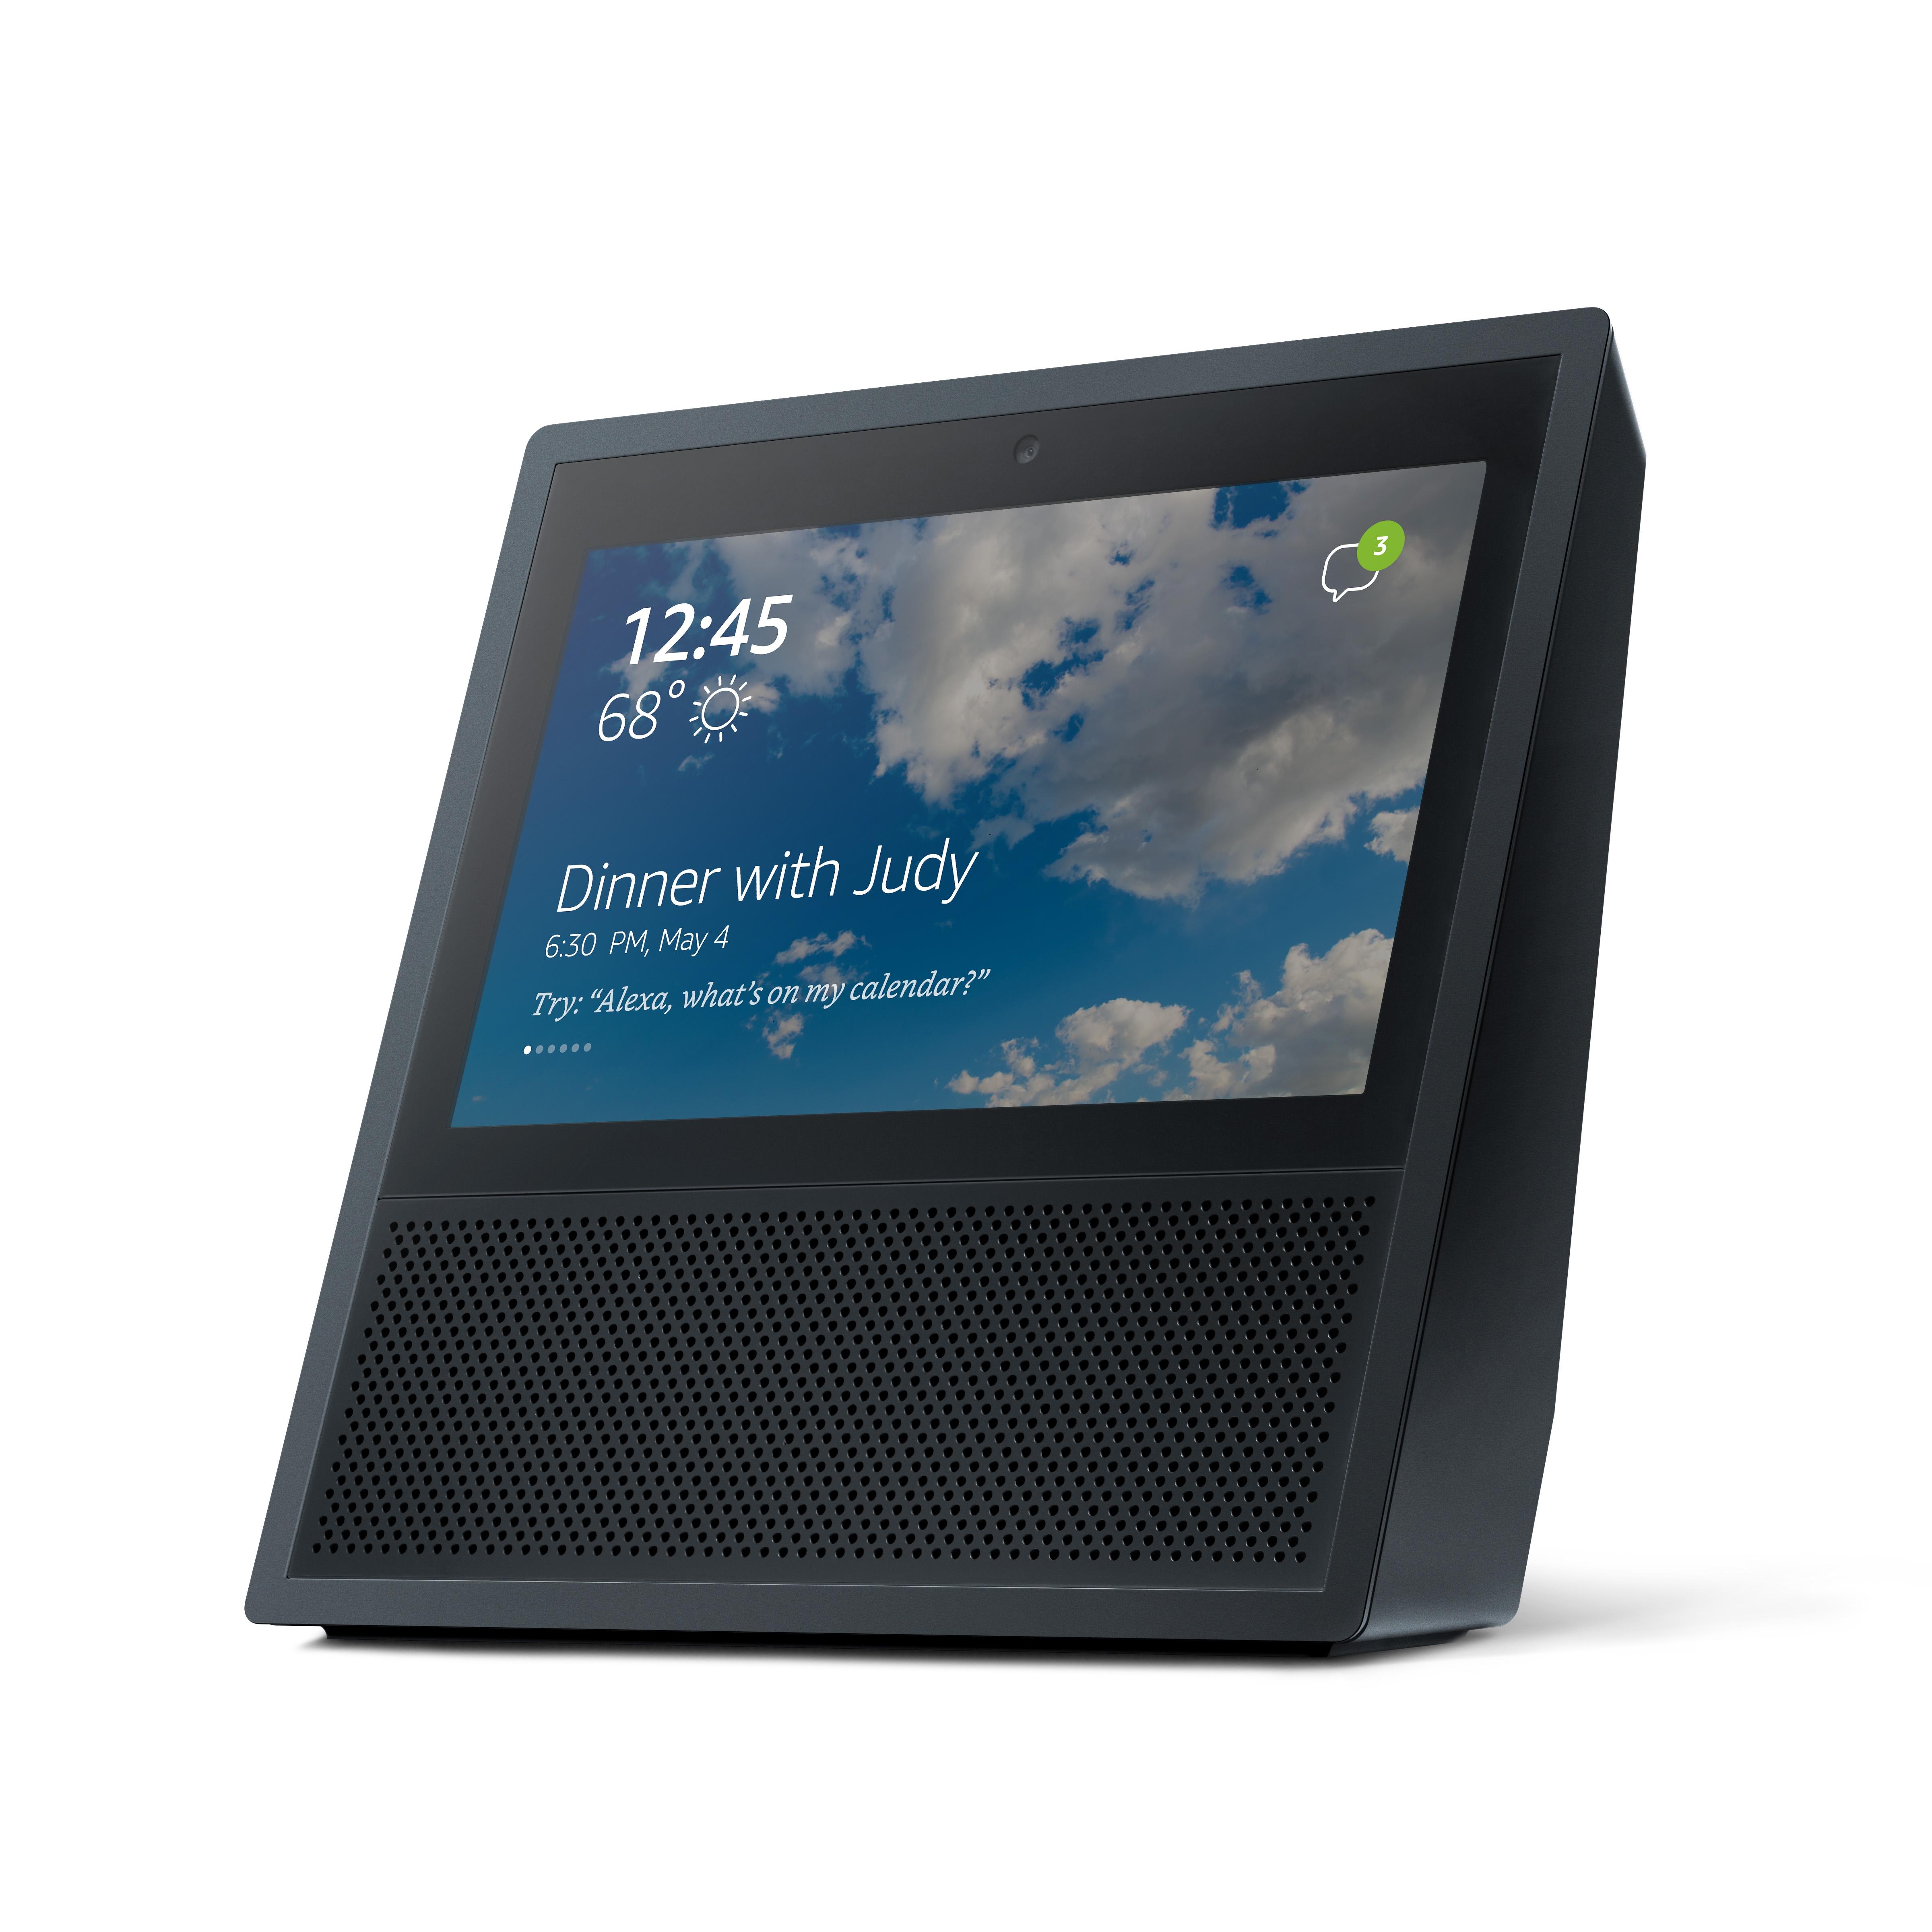 Amazon - Press Room - Product Images - Amazon Echo Show